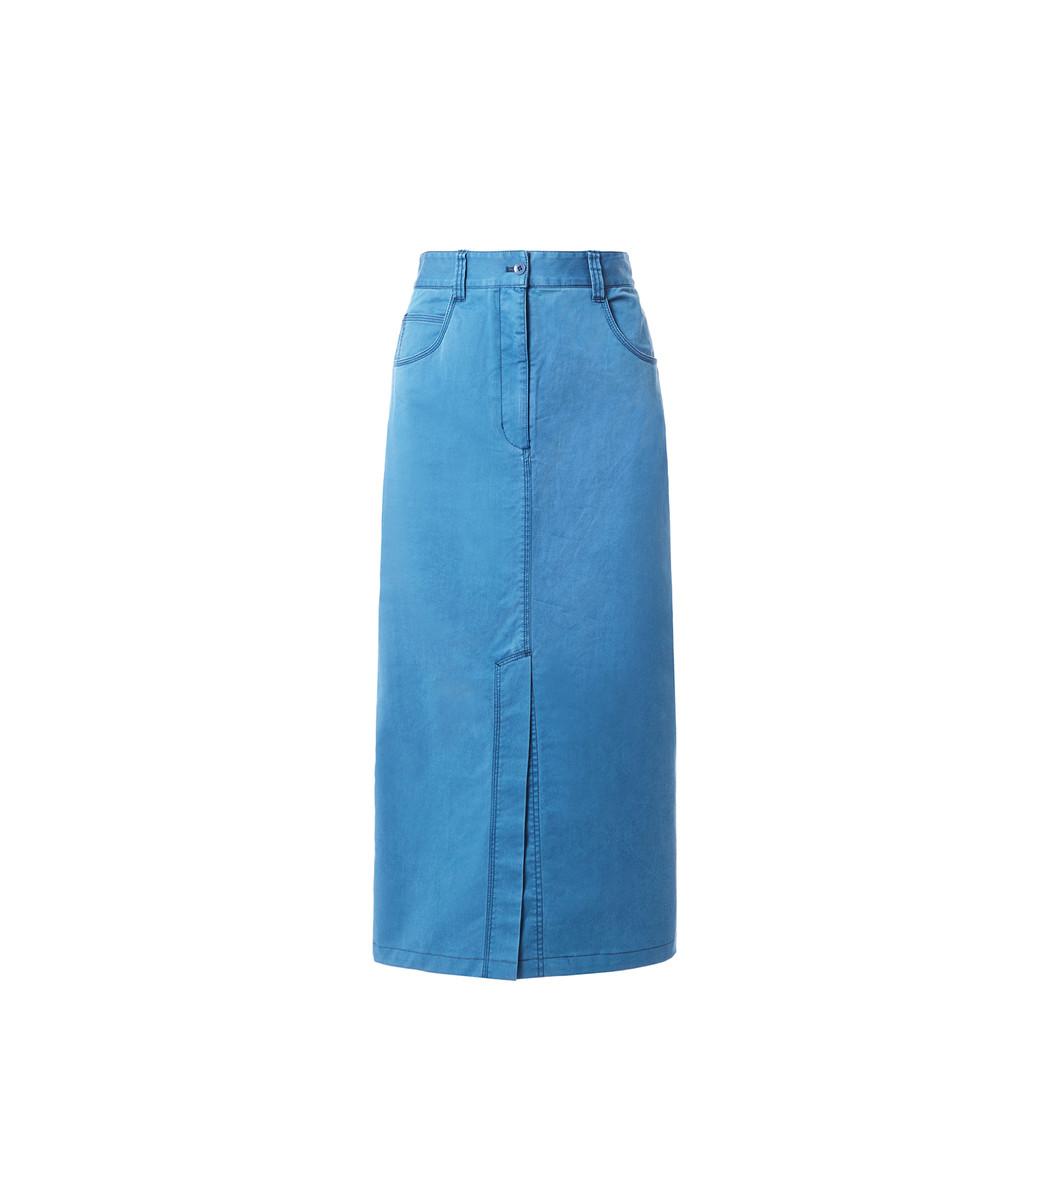 Tibi Washed Indigo Twill Pencil Skirt